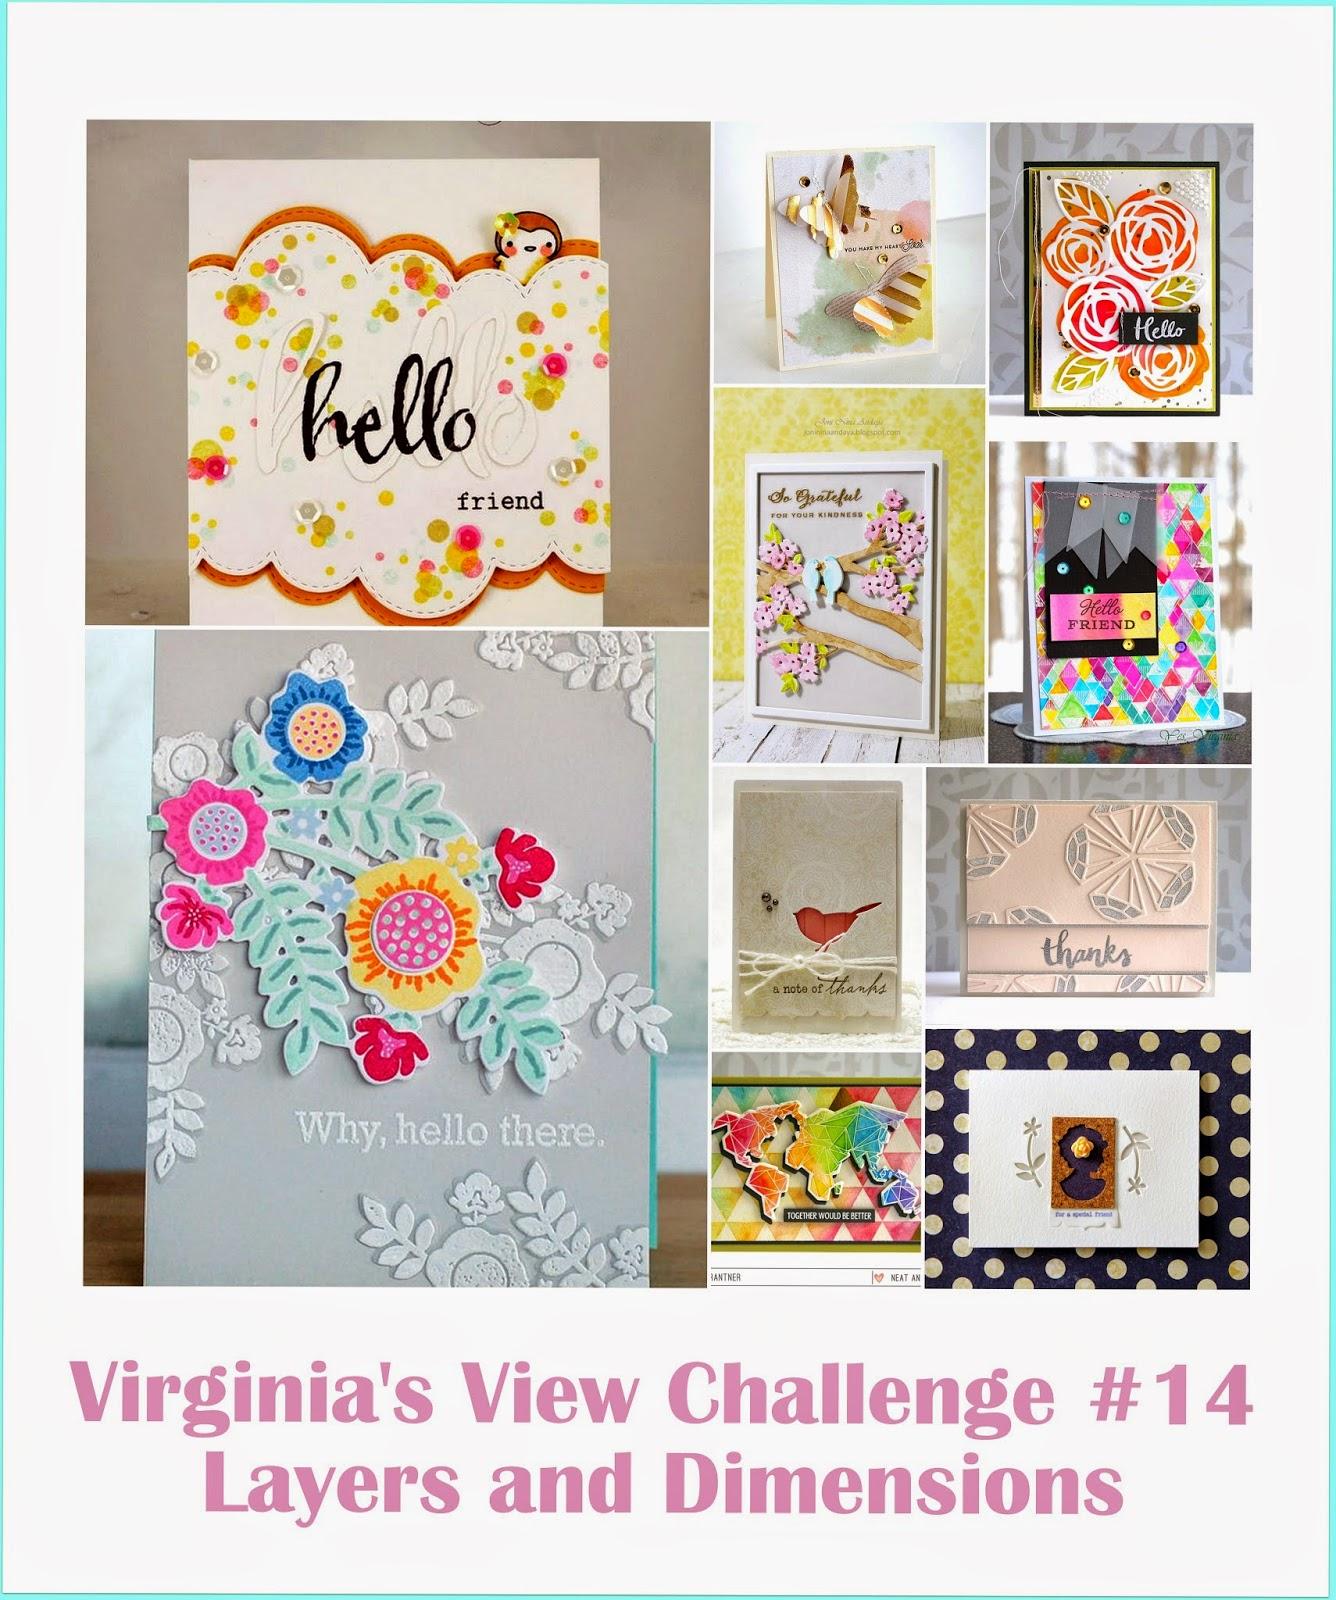 http://virginiasviewchallenge.blogspot.ie/2015/04/virginias-view-challenge-14.html